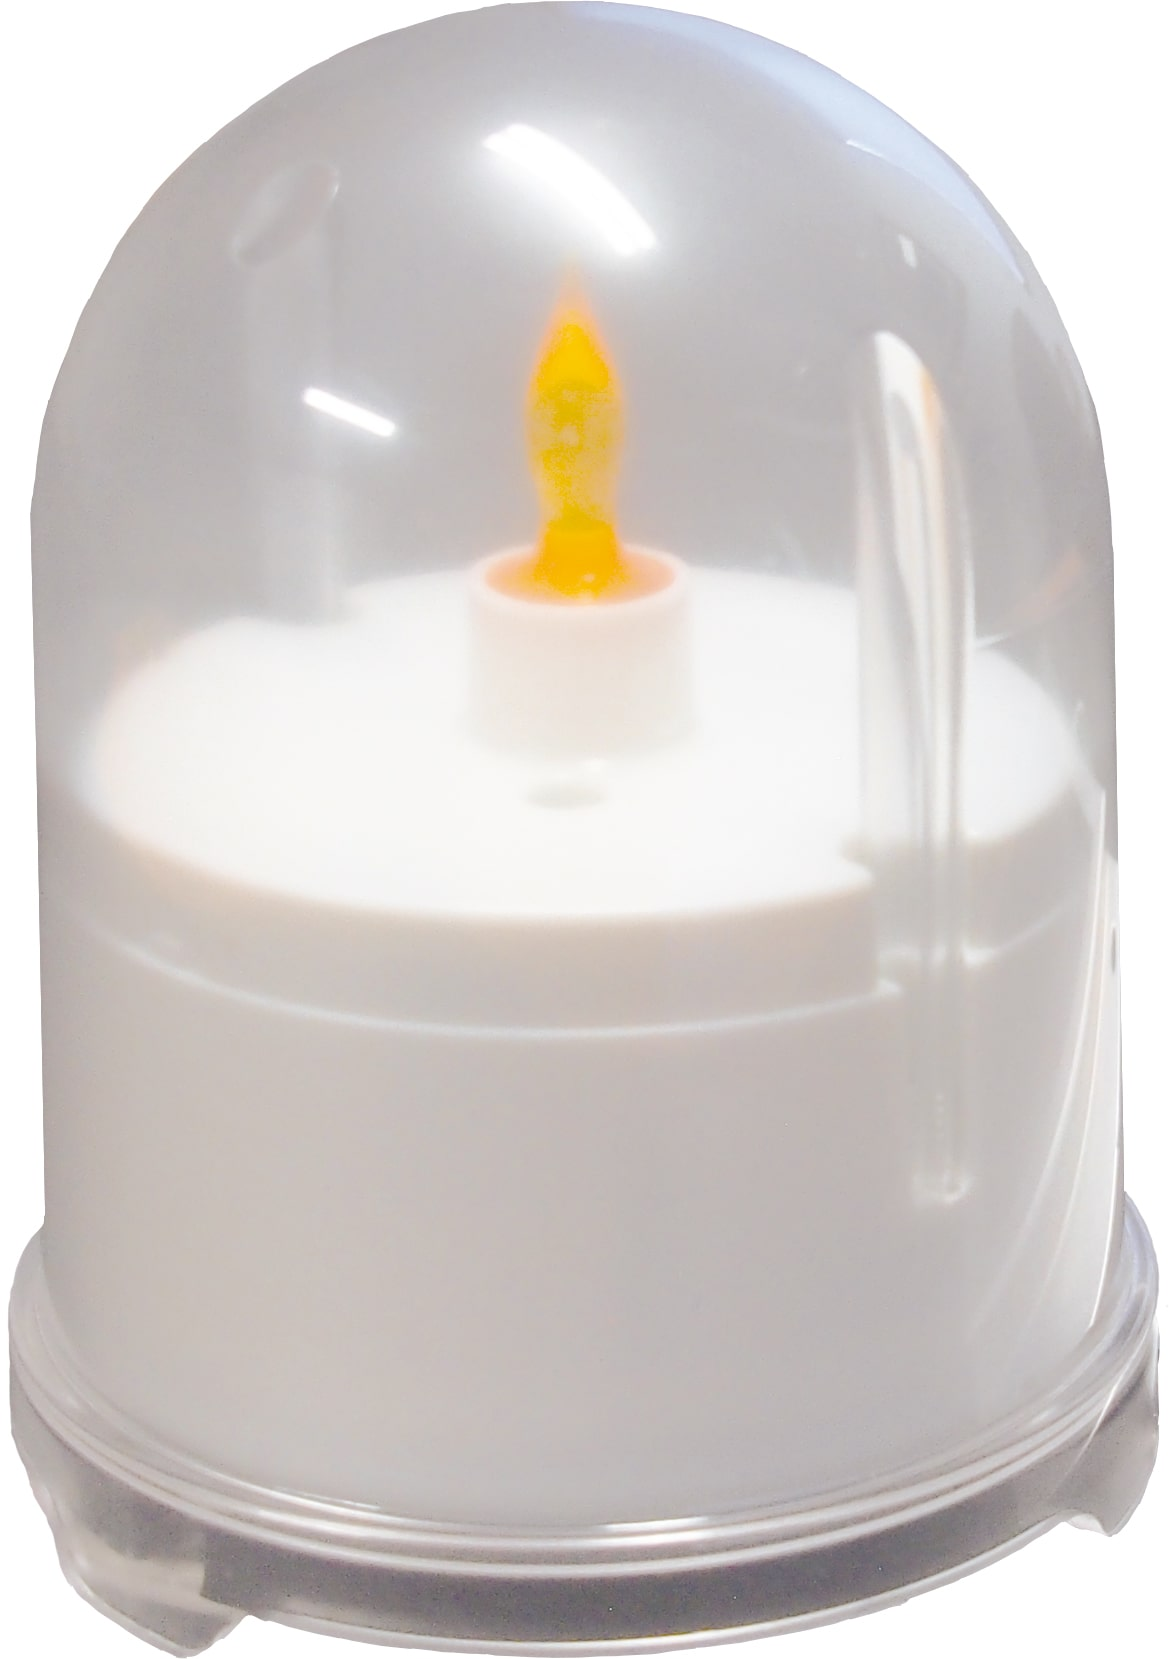 灯籠用LED灯火